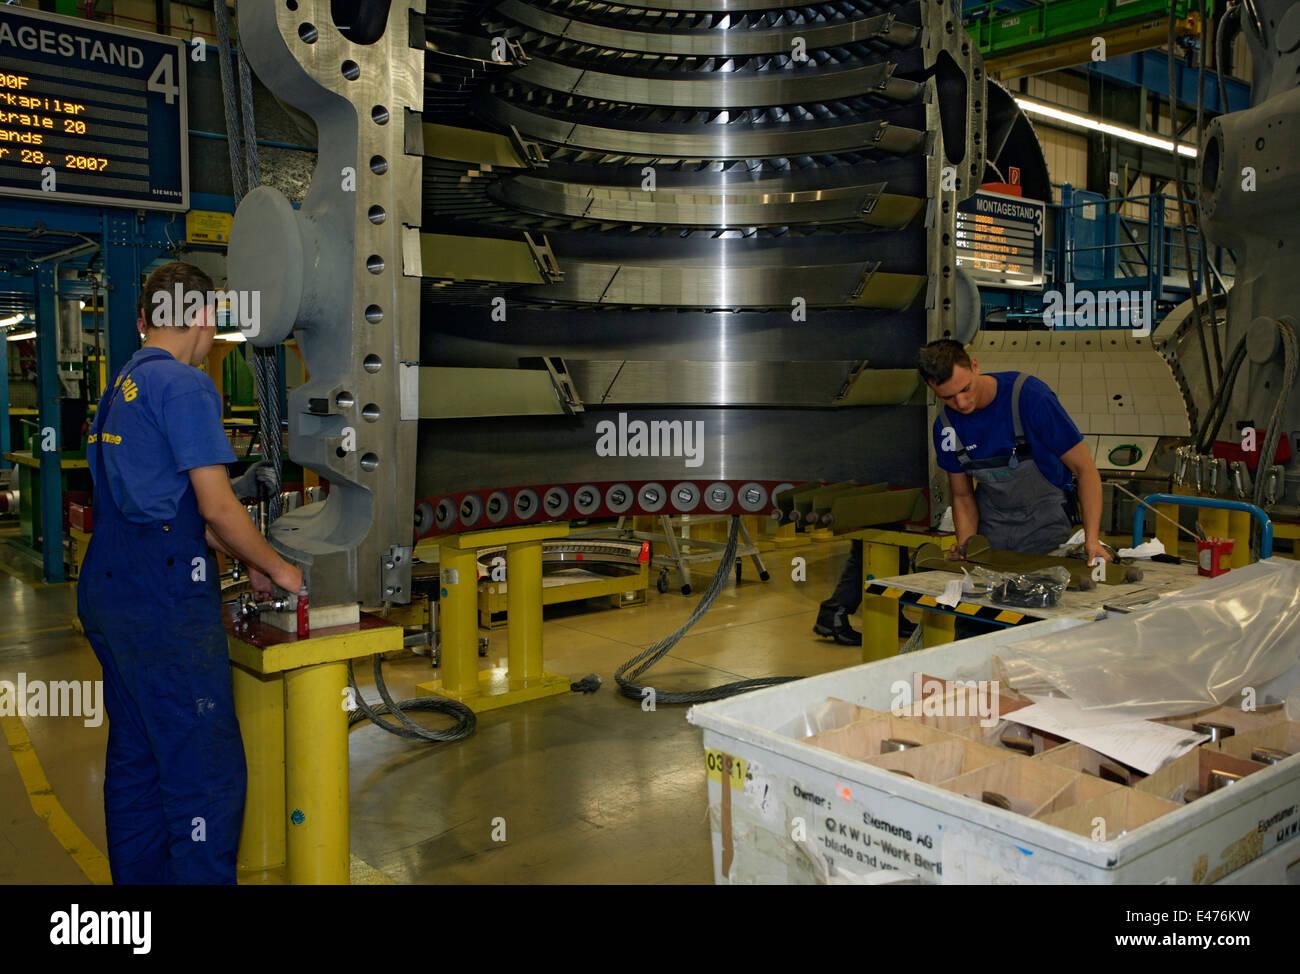 Siemens gas turbine plant in Berlin Stock Photo: 71459021